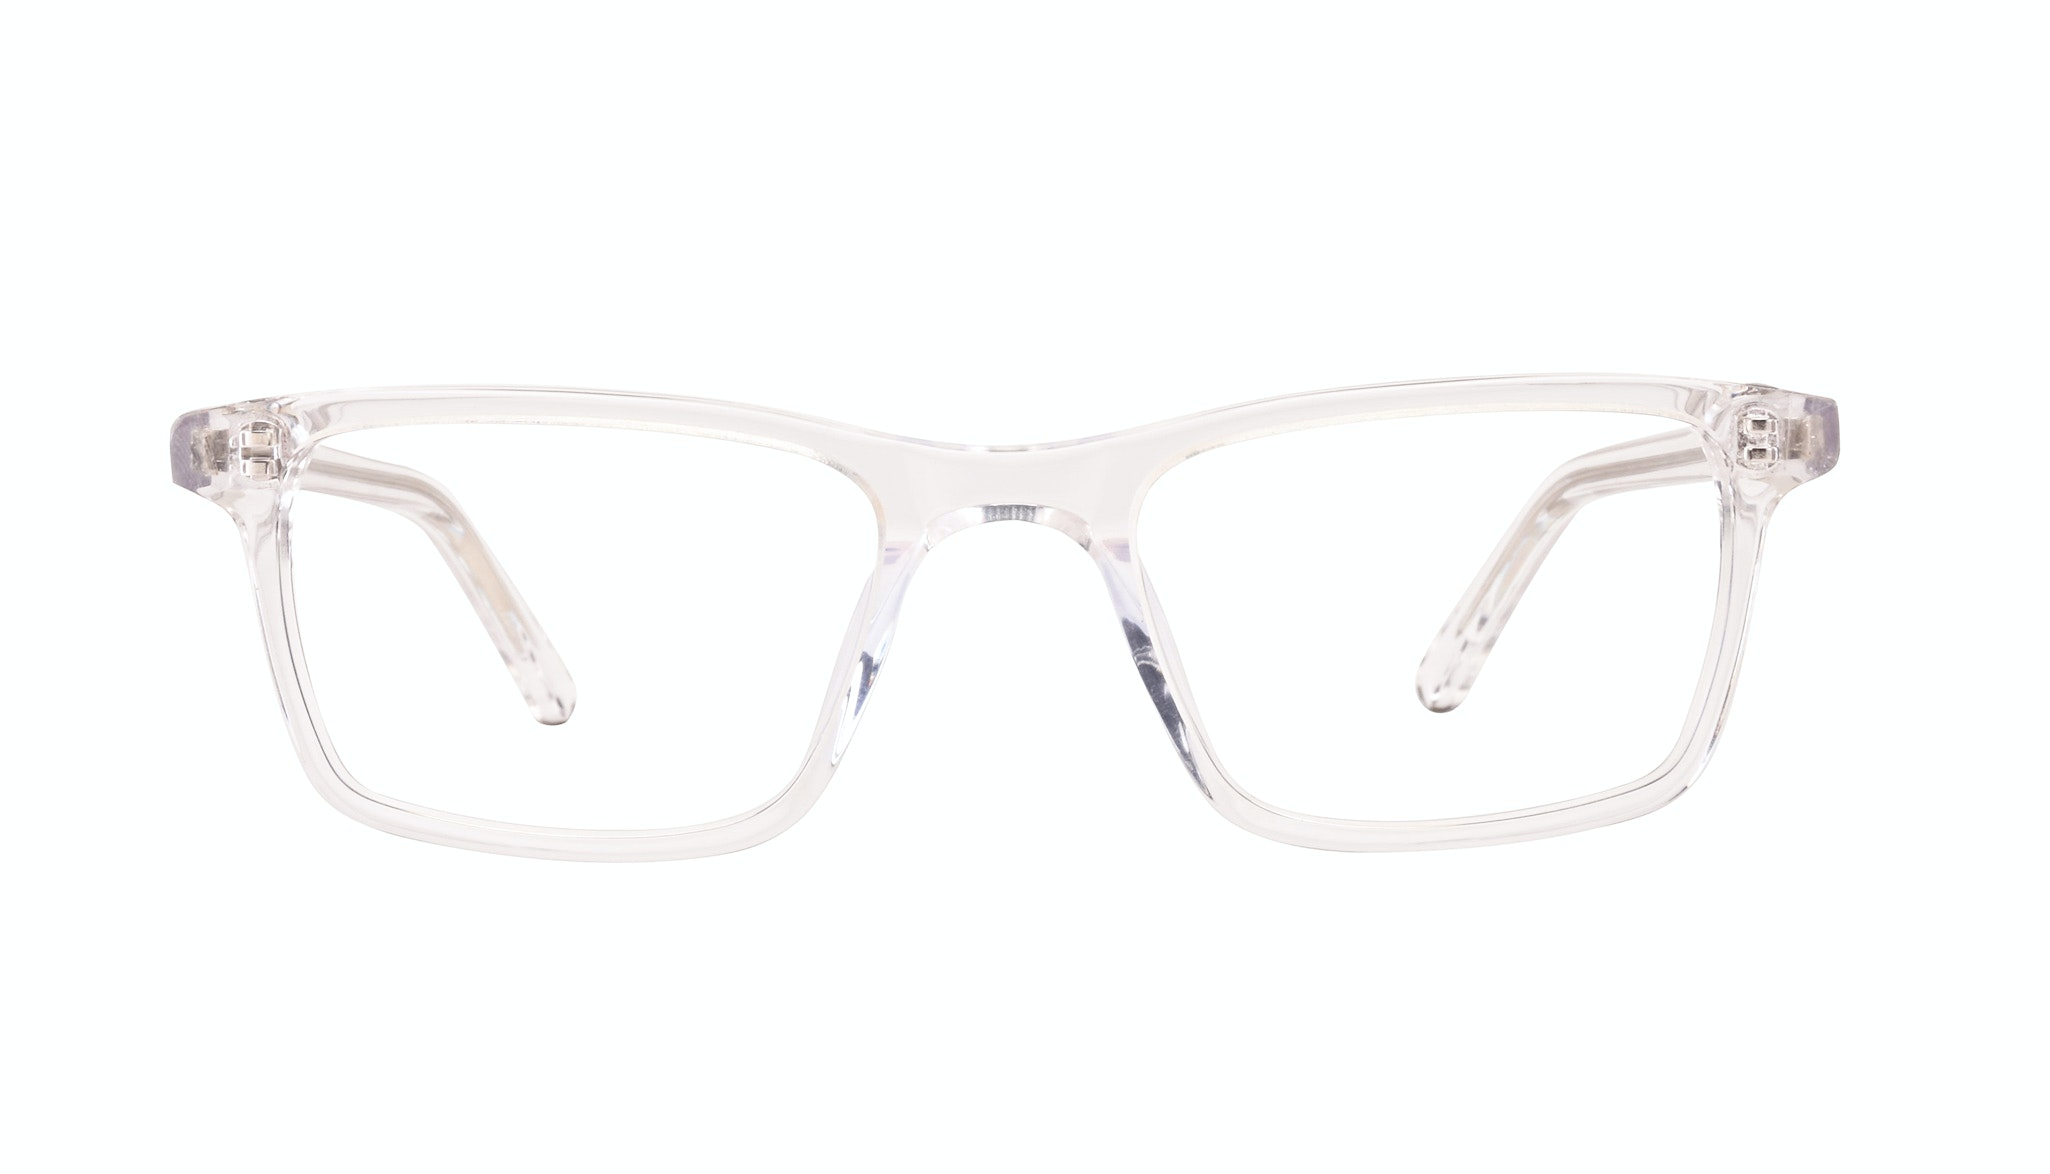 Affordable Fashion Glasses Rectangle Eyeglasses Men Henri SML Clear